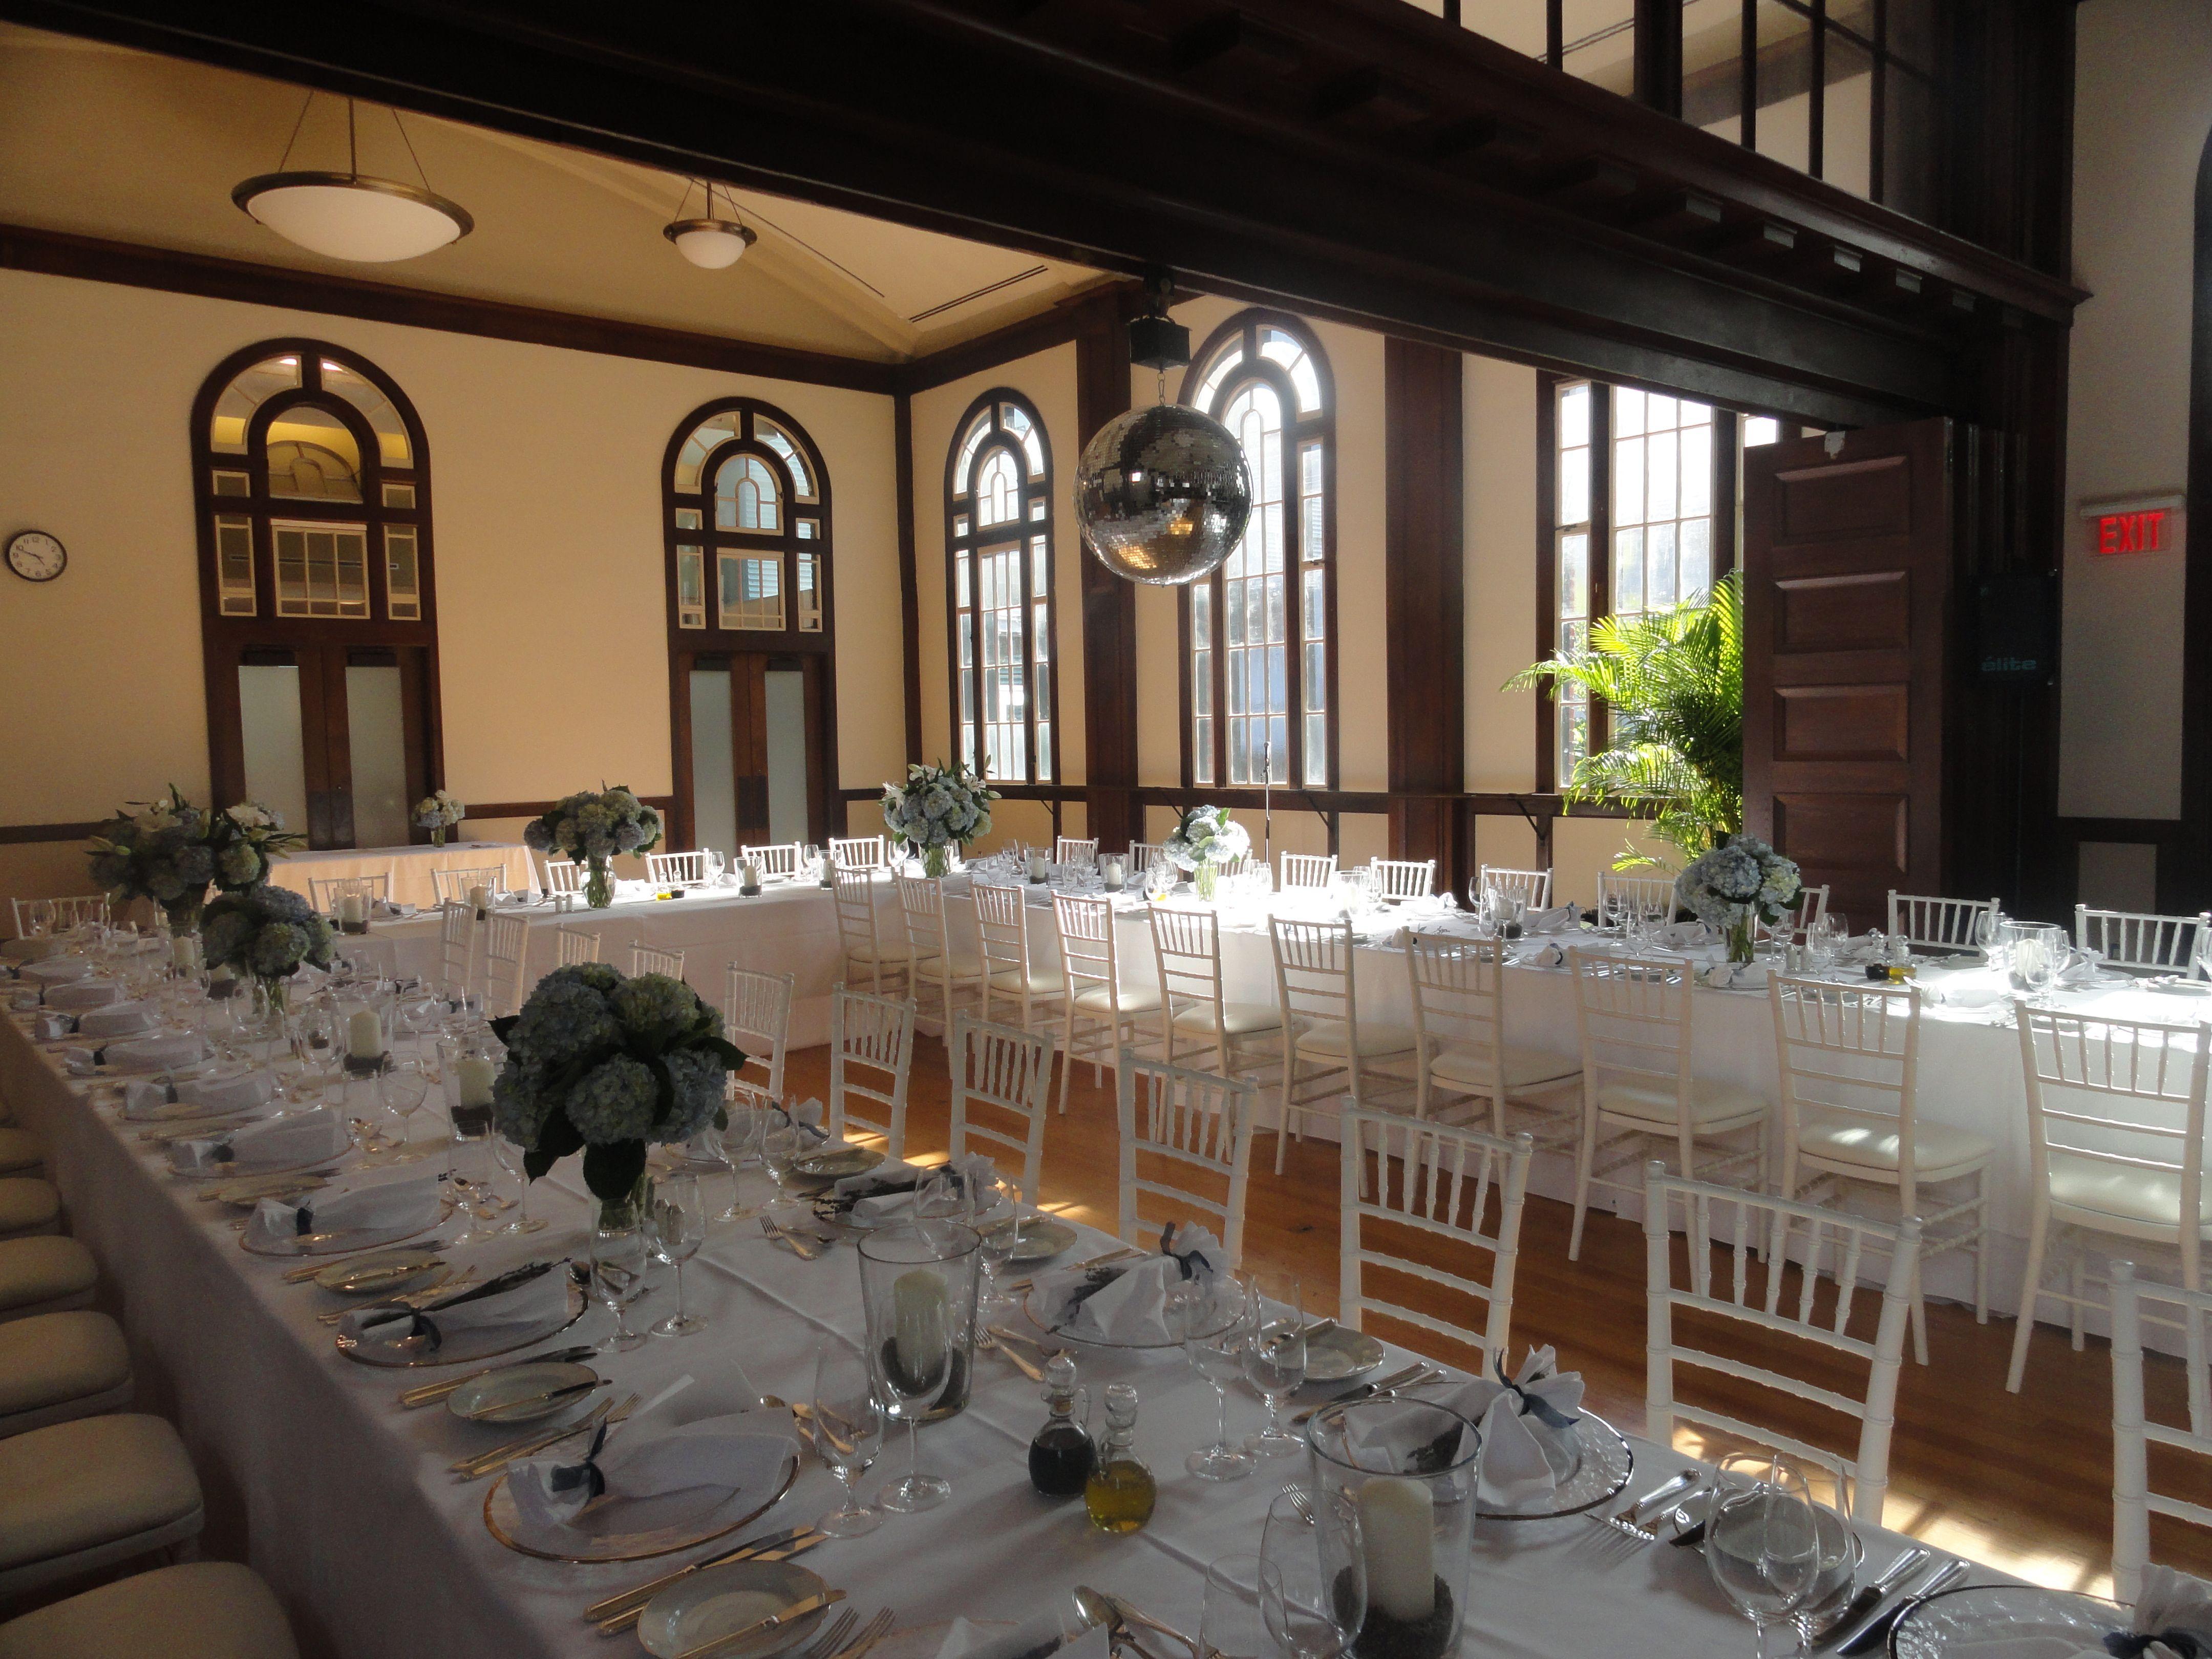 Wedding dinner Venue National Ballet School, Toronto ON